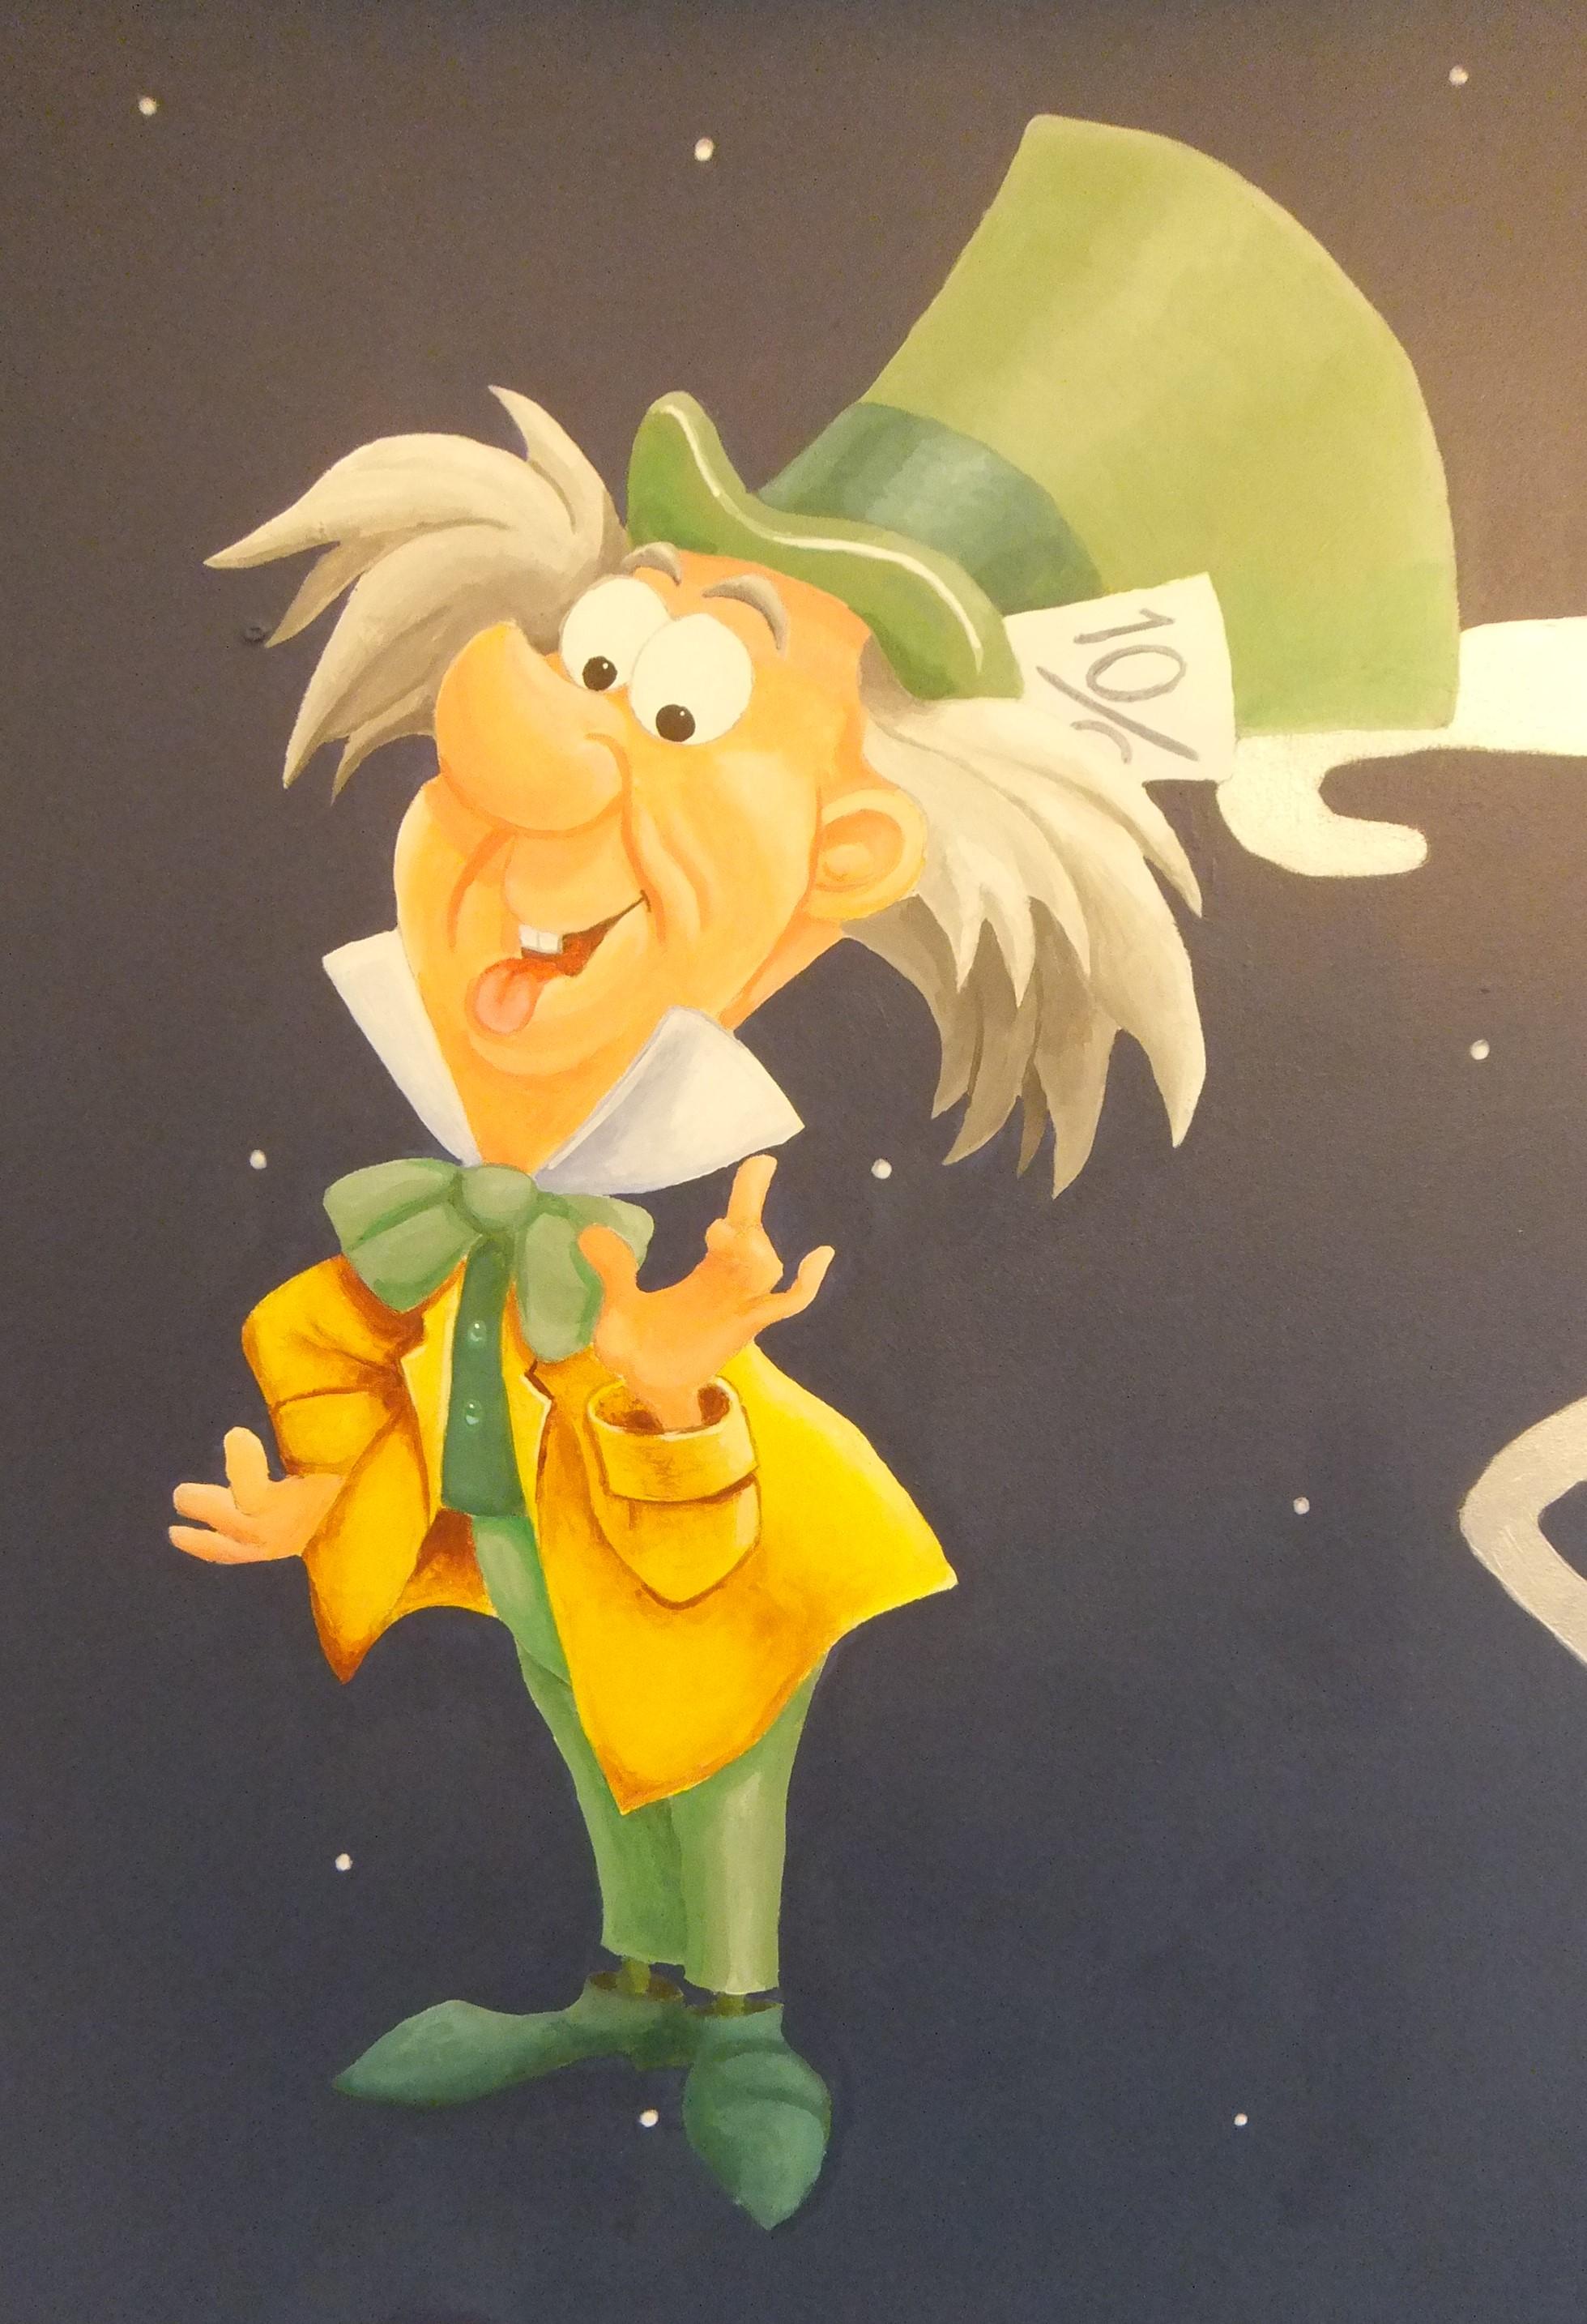 Disney Mad Hatter Alice in Wonderland